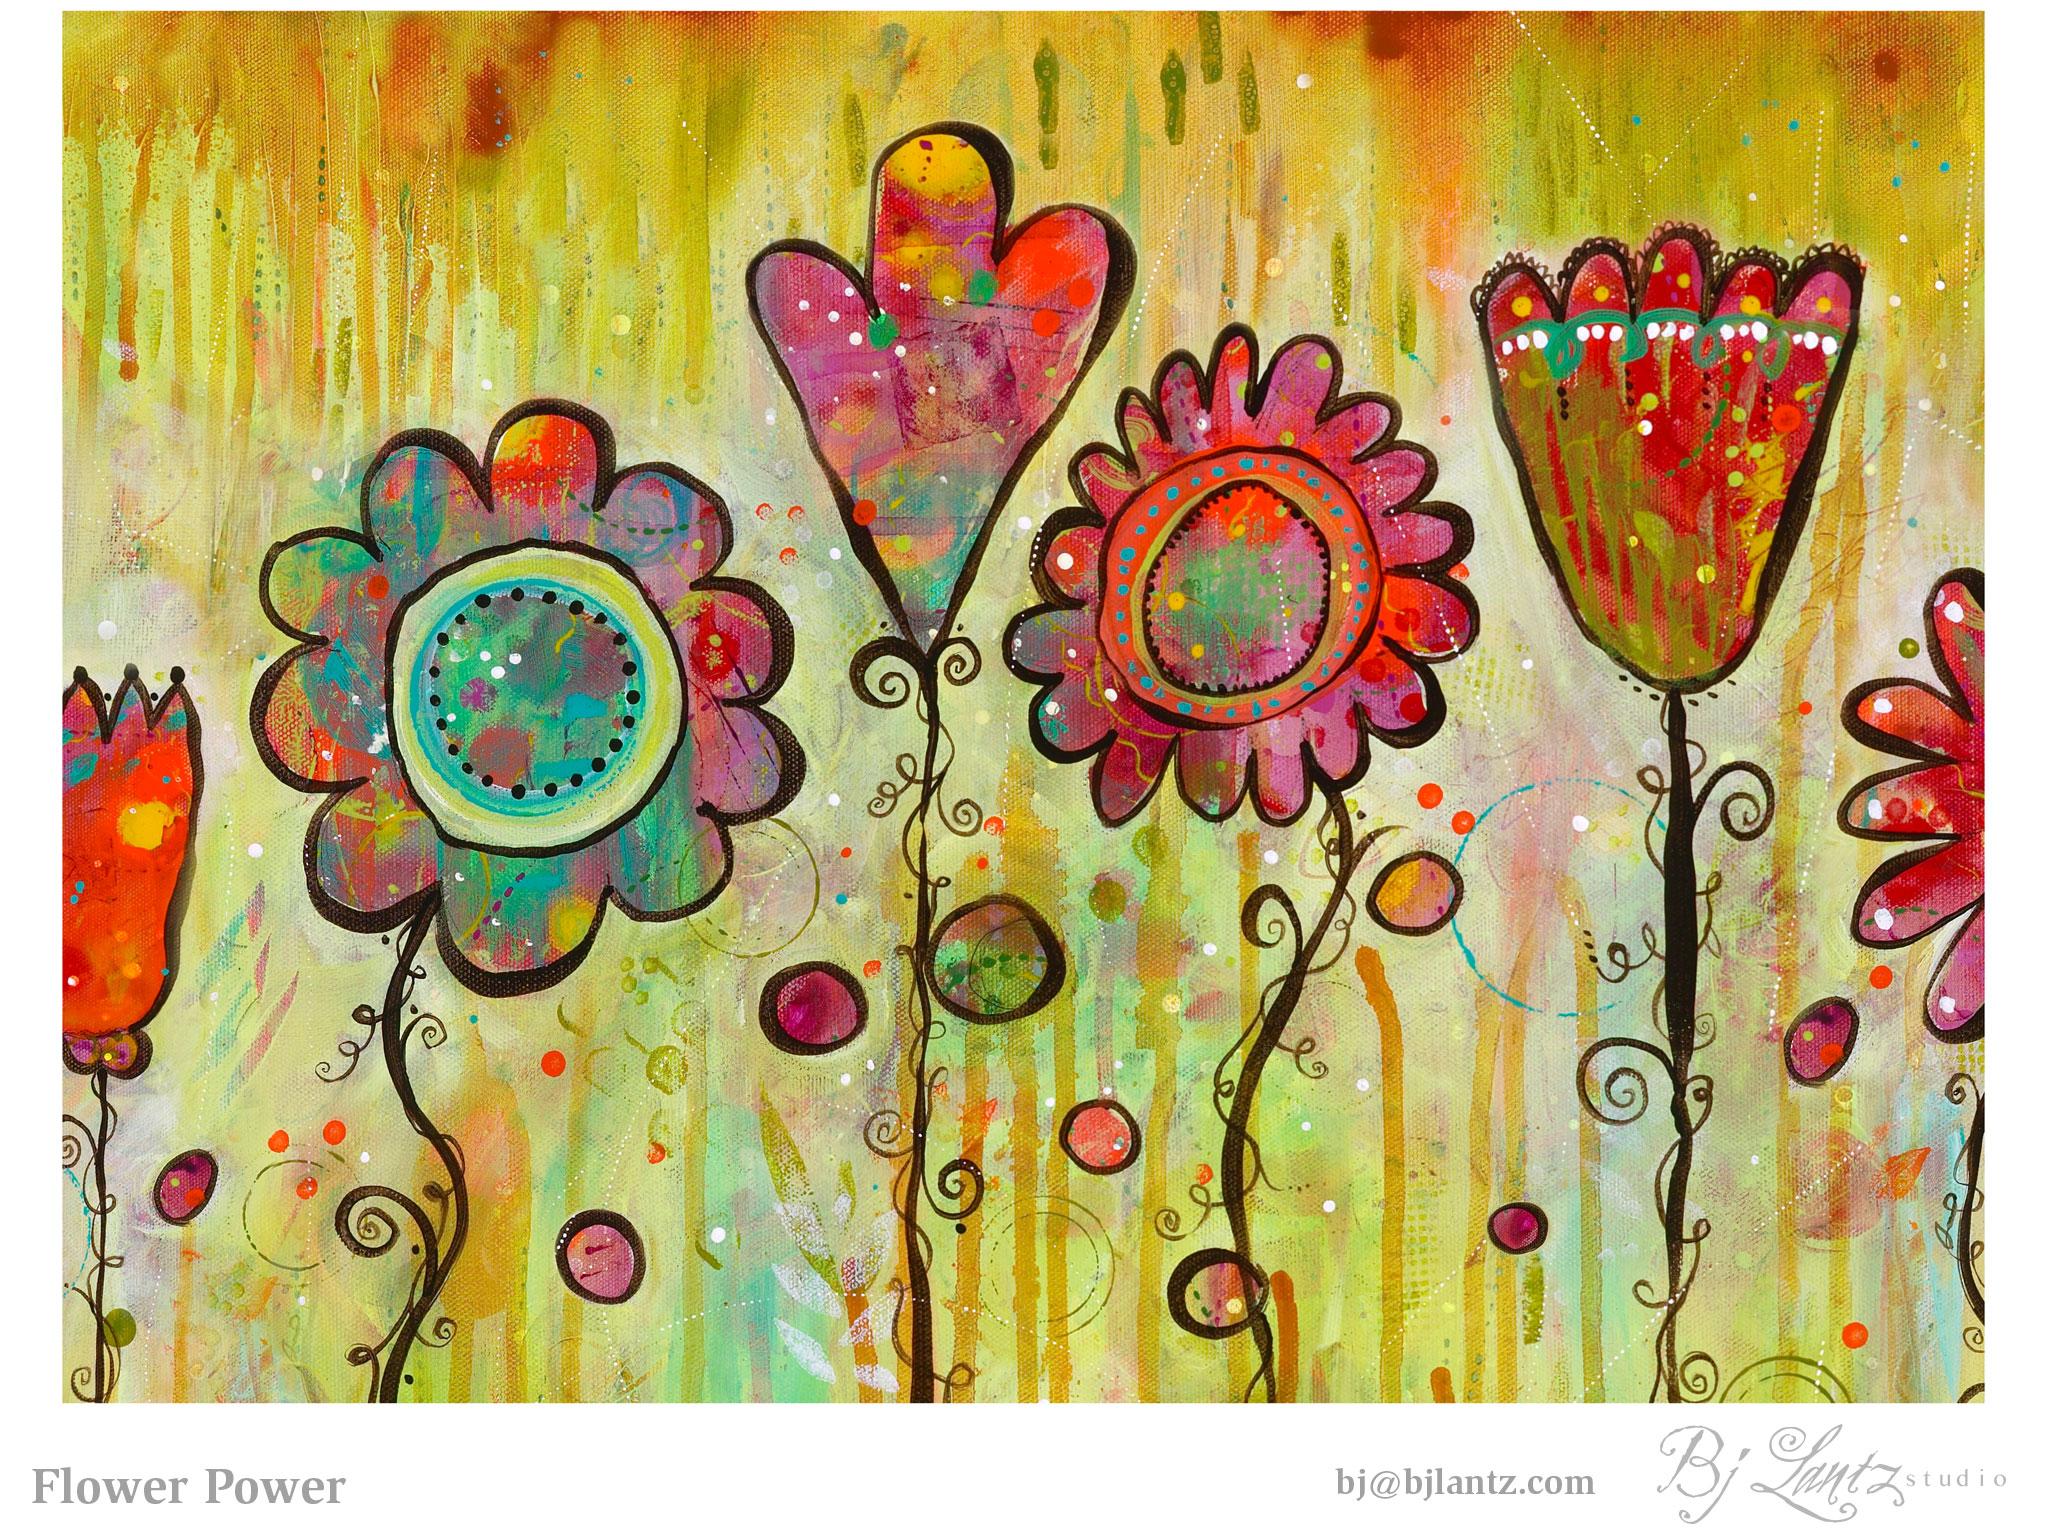 FlowerPower_BJLantz_15-1.jpg